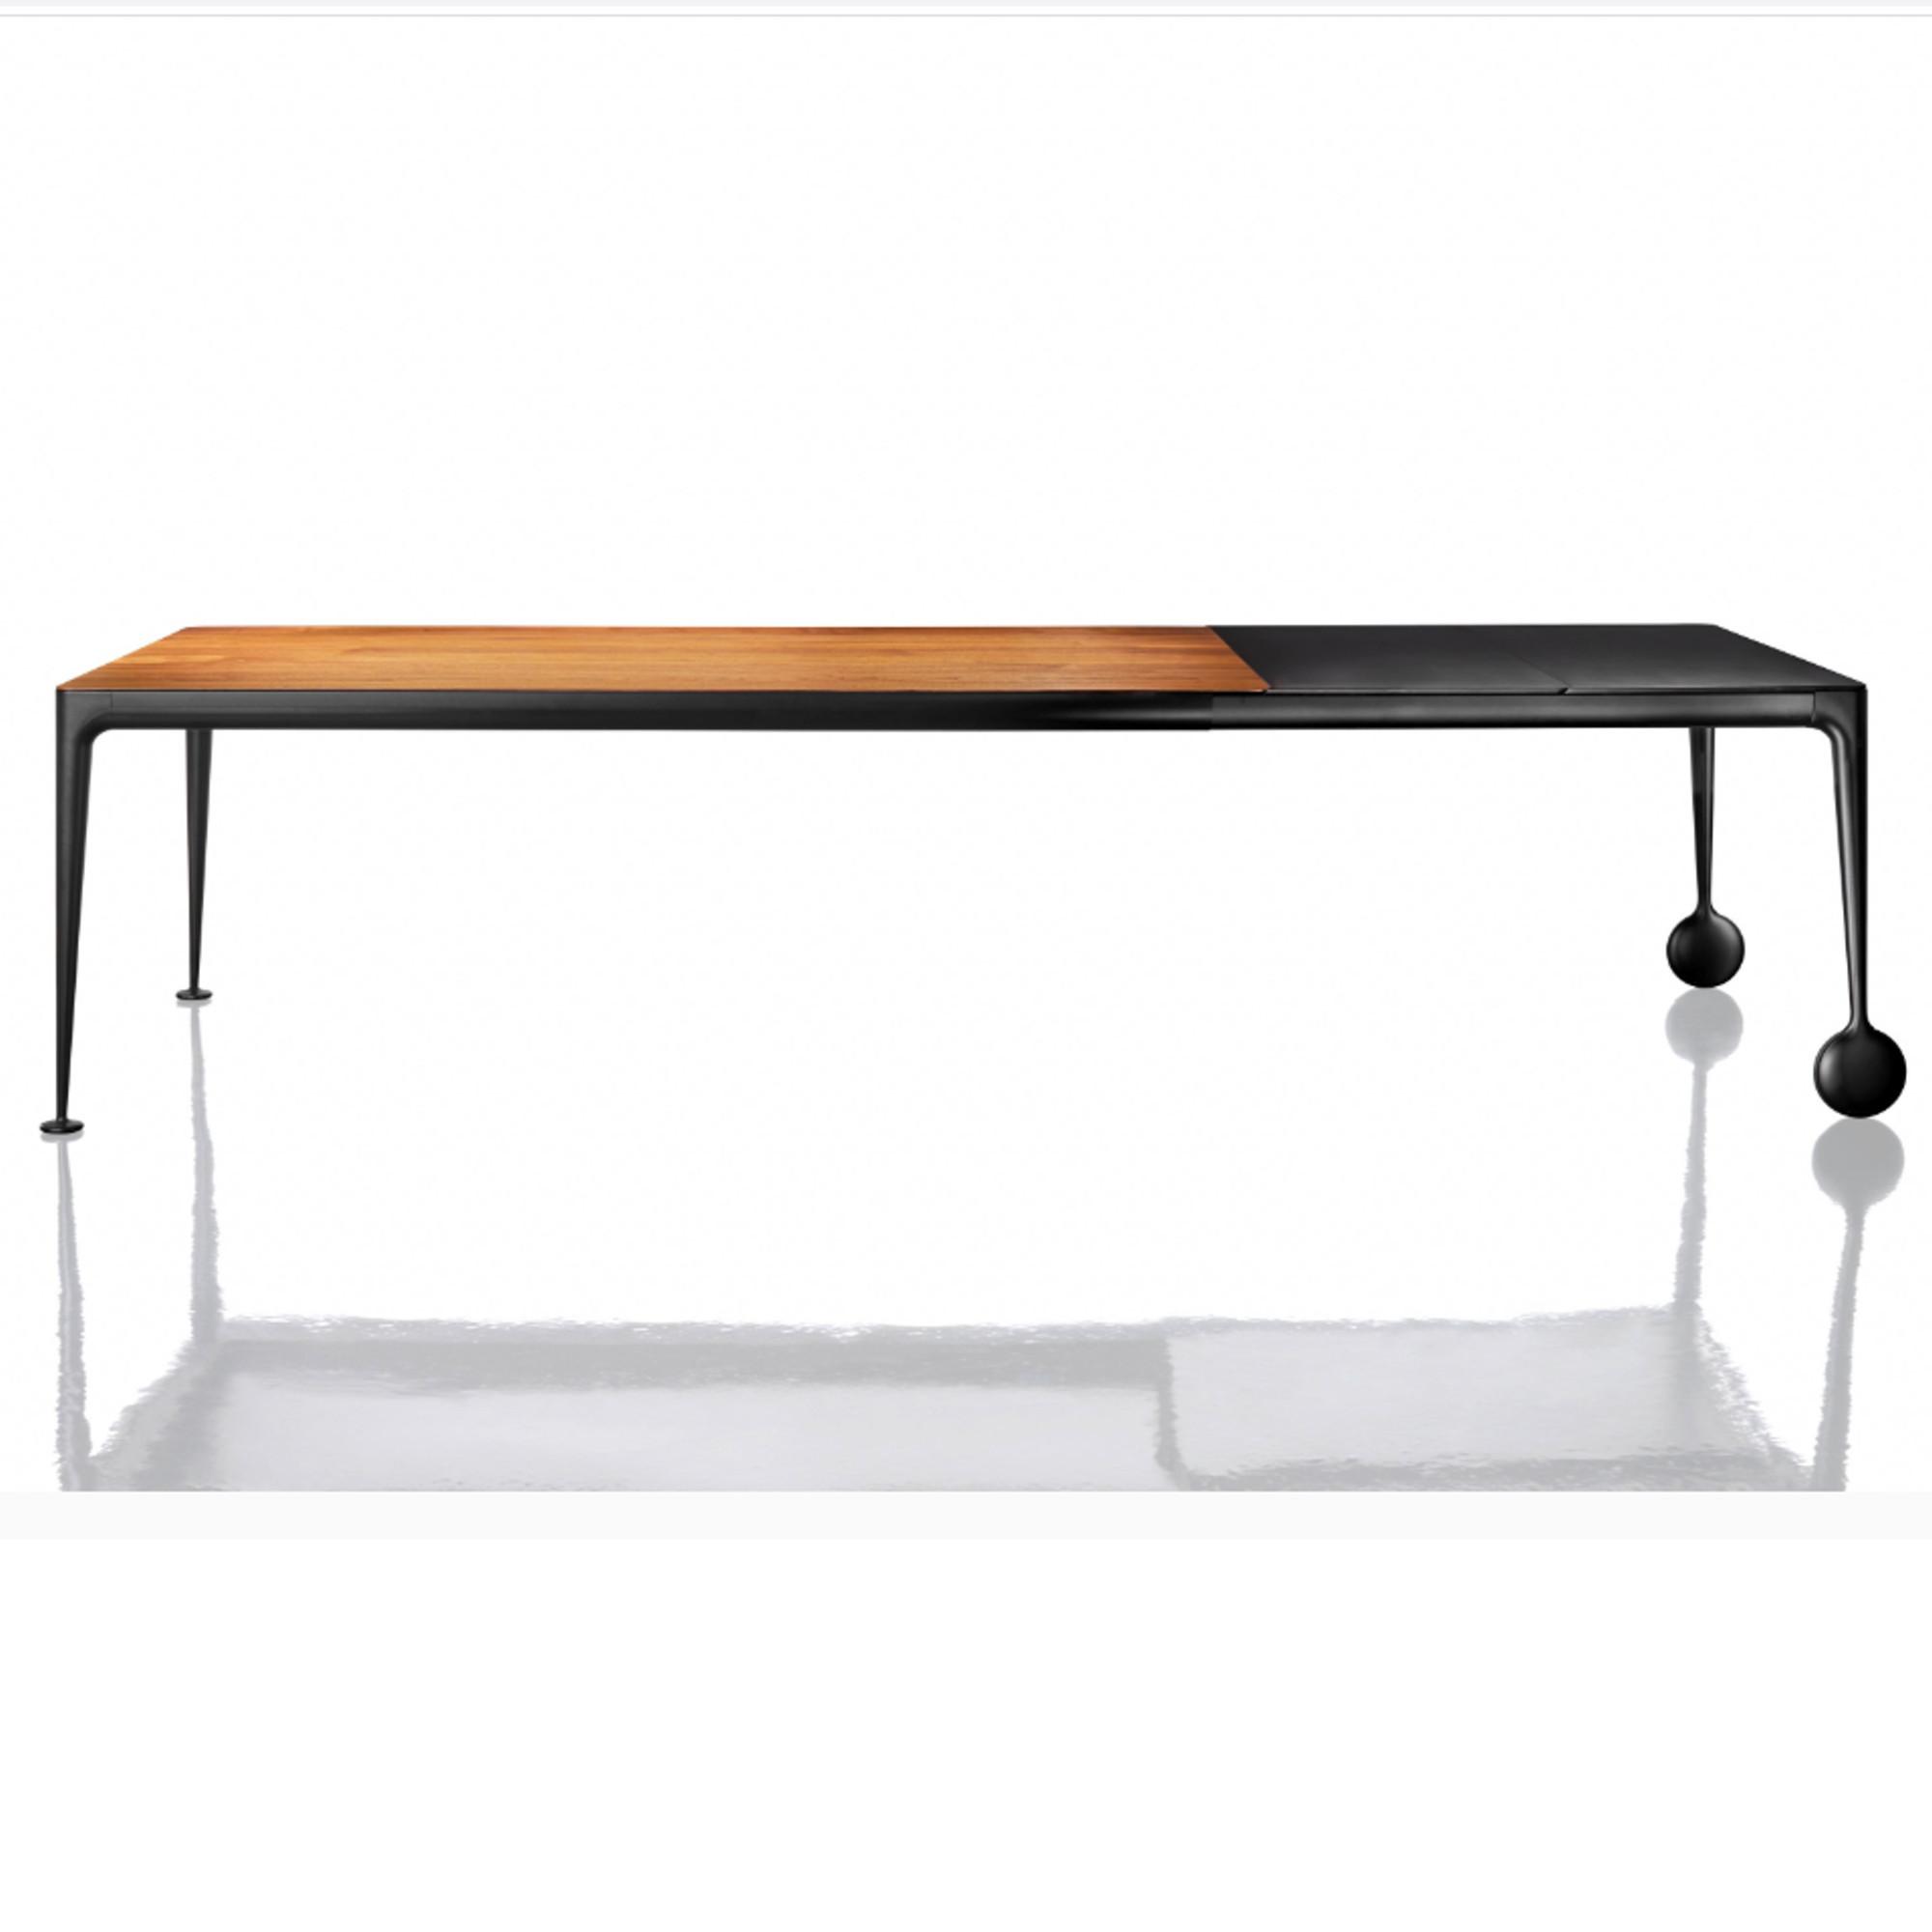 Tavolo Allungabile Legno Esterni.Big Will Extensible Table Extending Tables Tables Magis